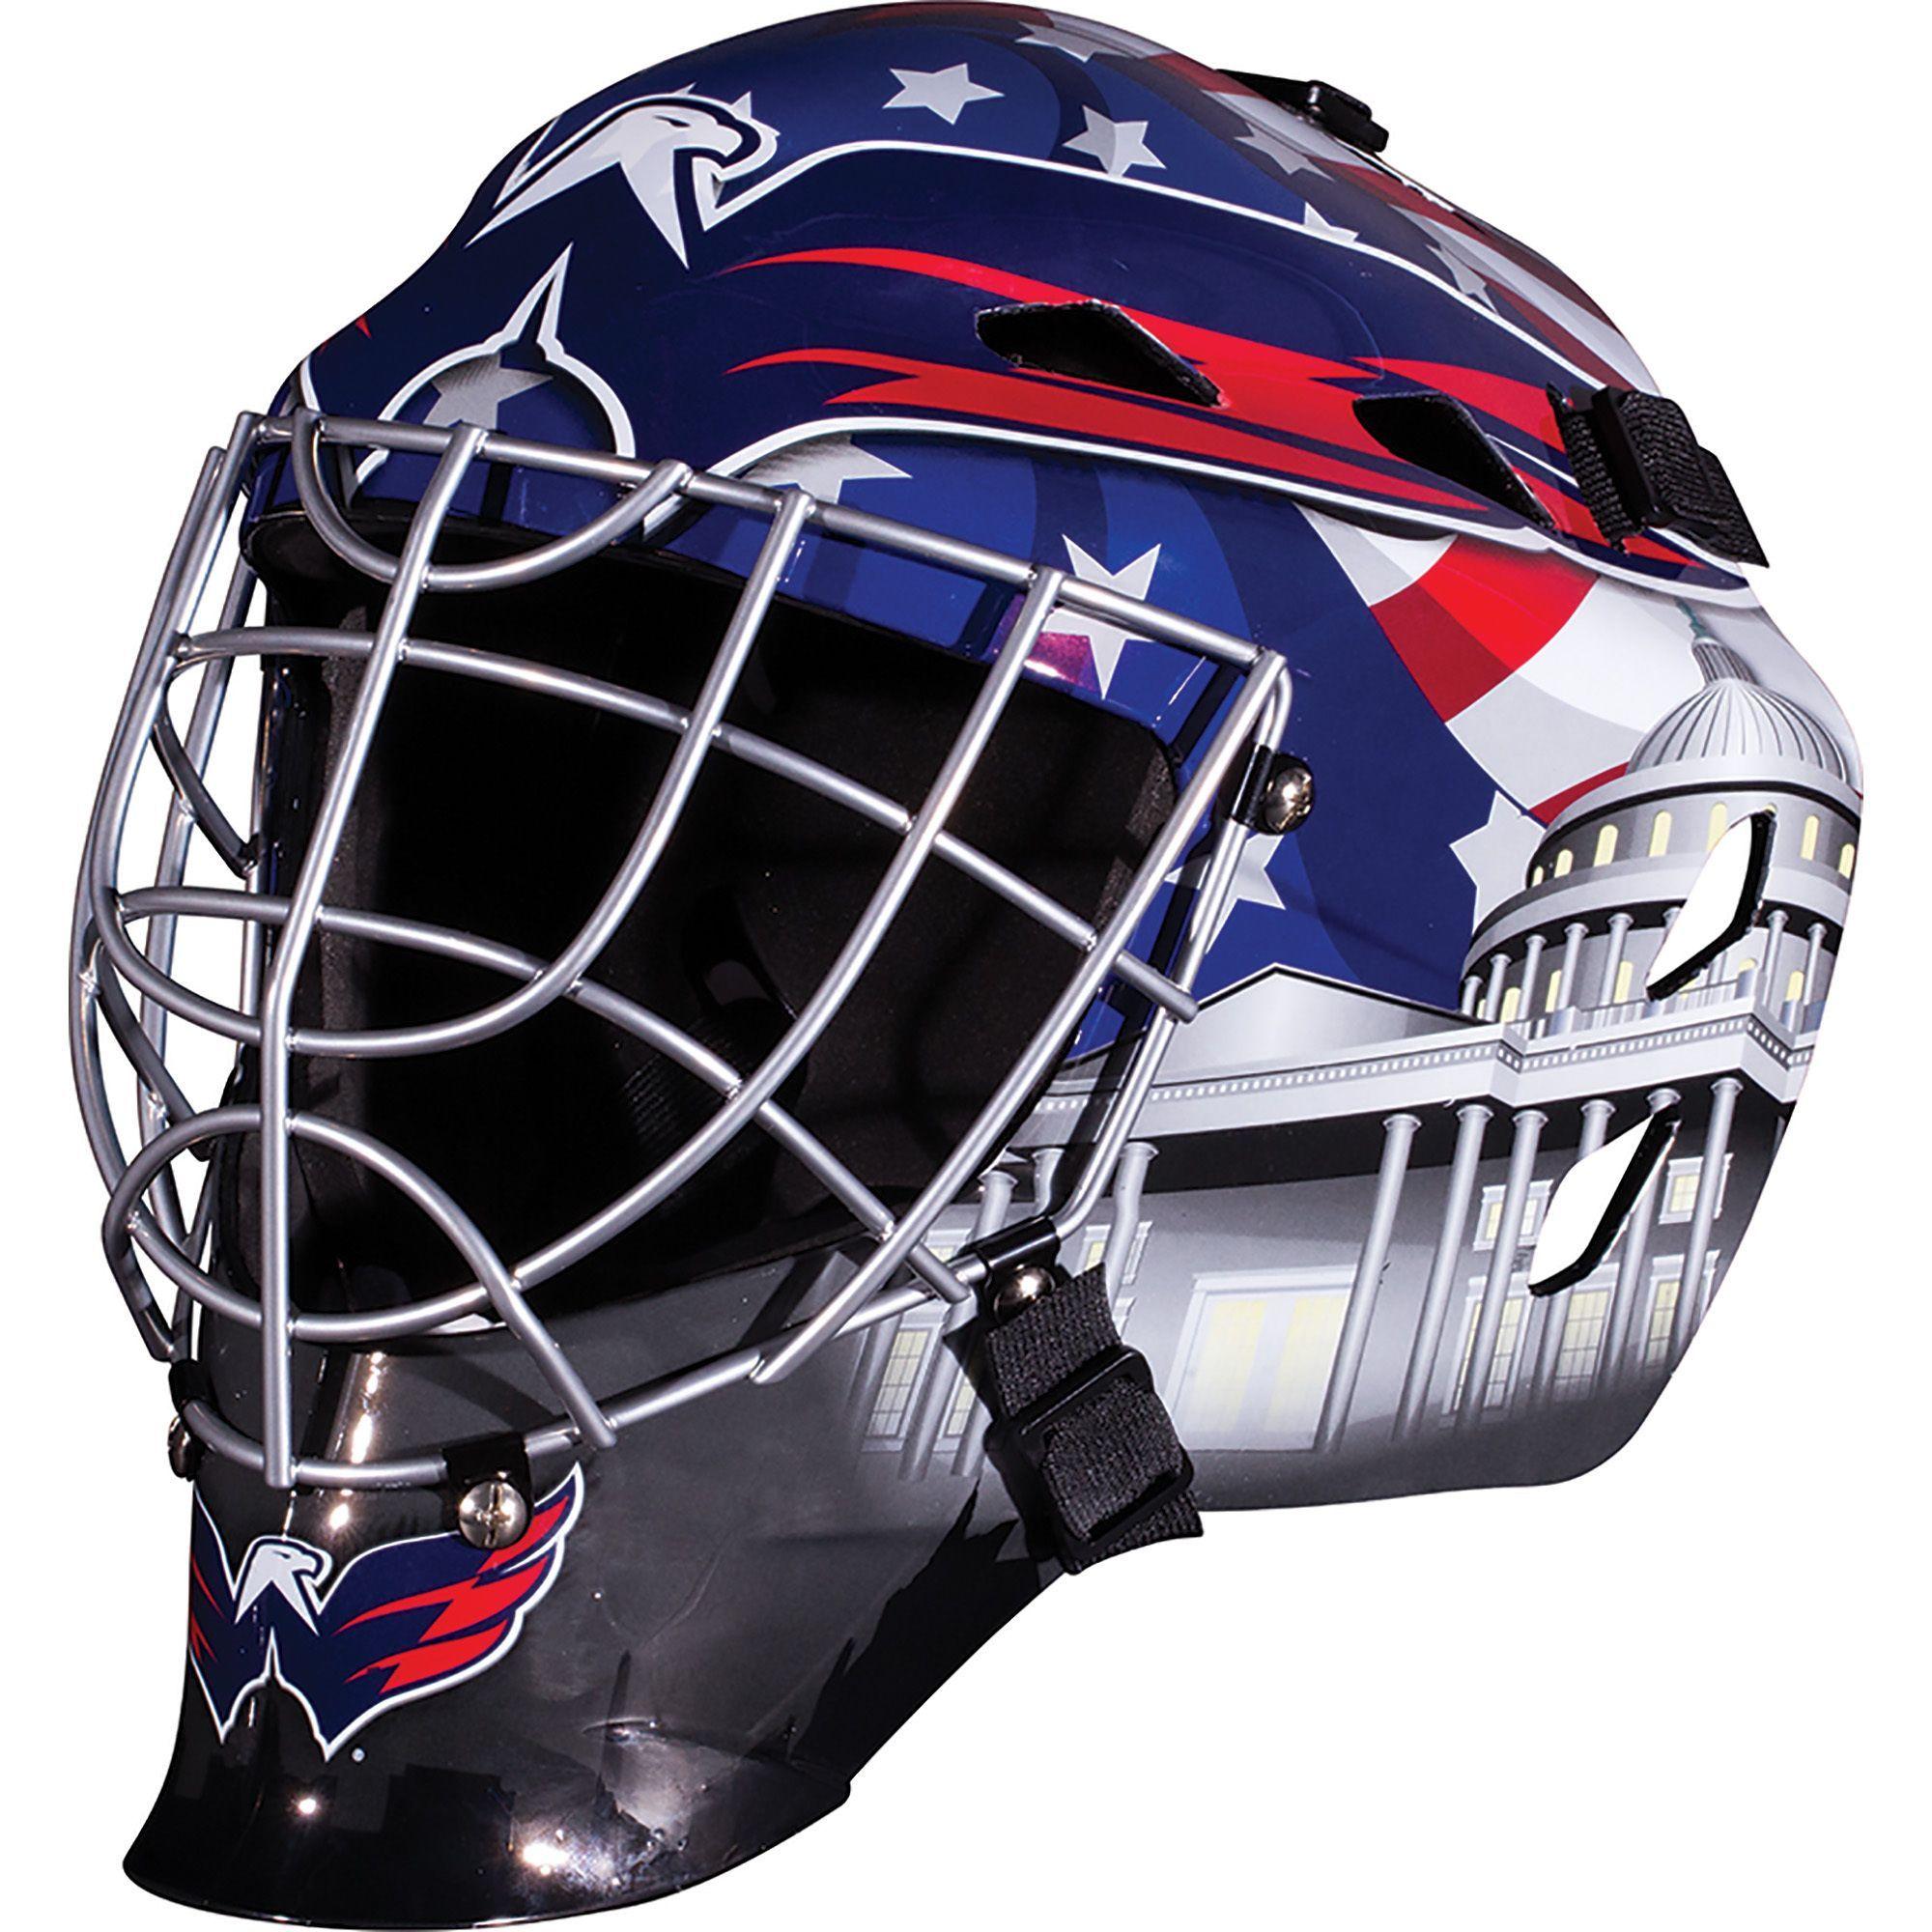 Franklin Sports NHL Team Goalie Mask One Size Fits most